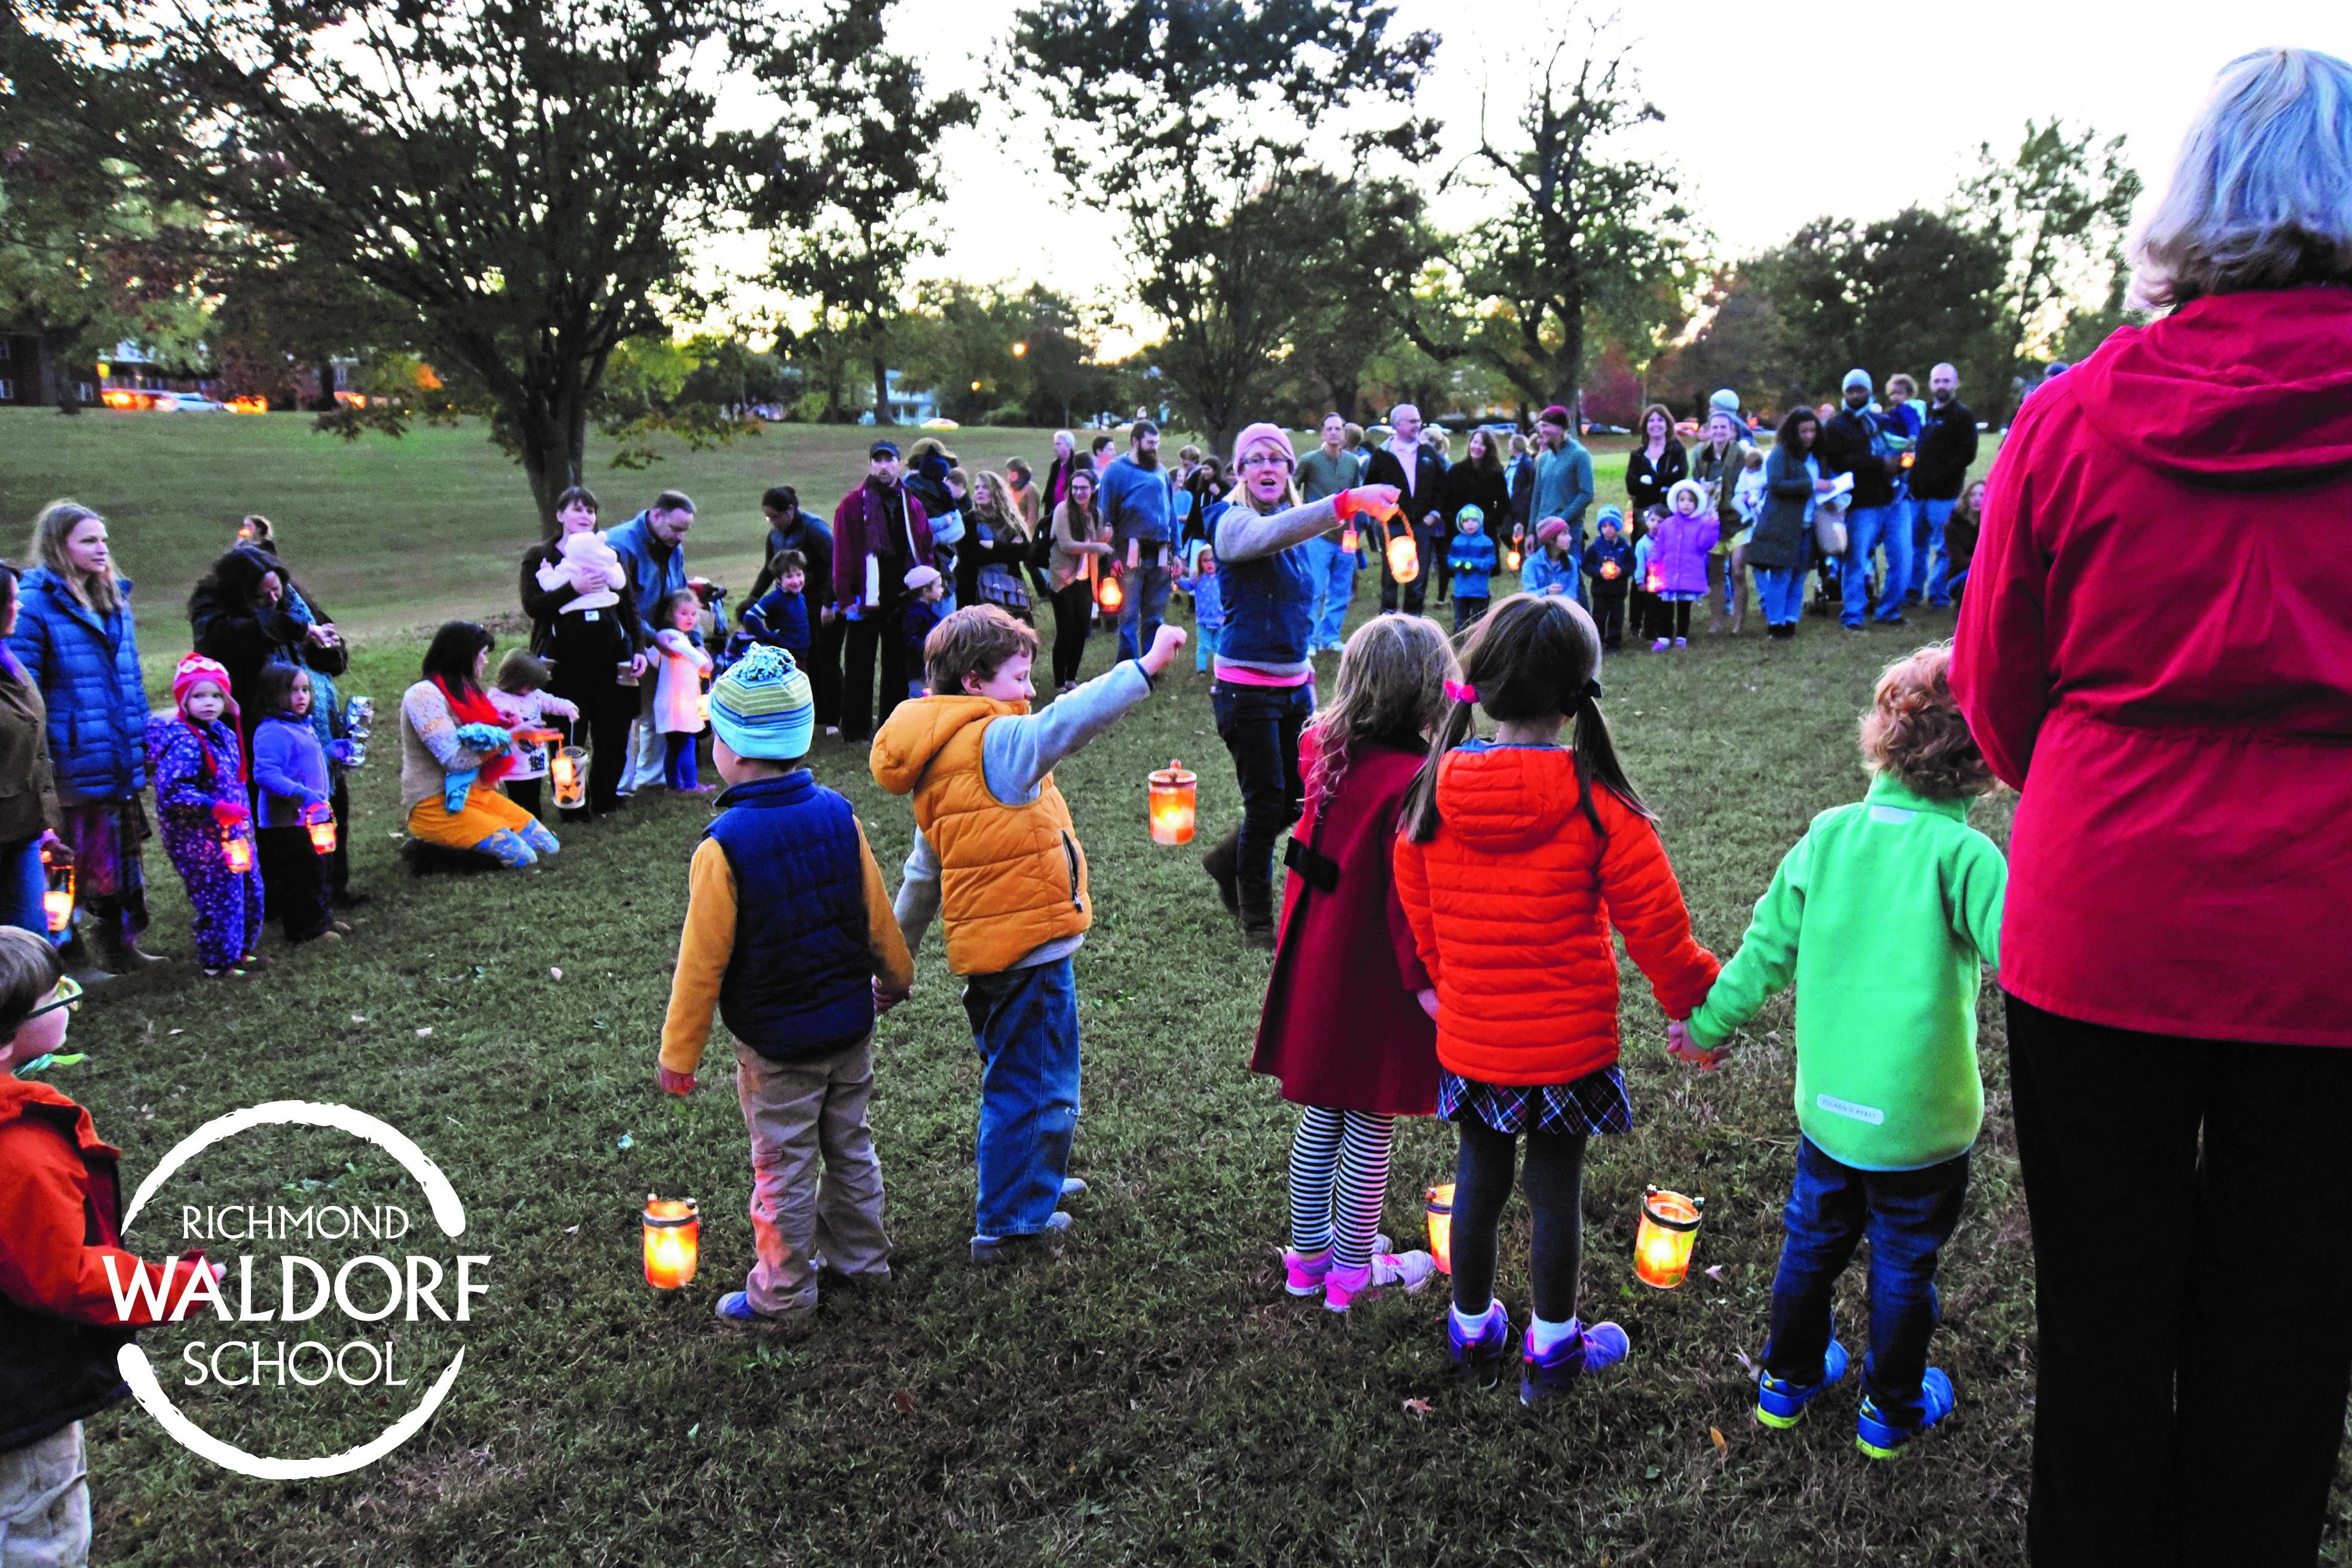 singing lantern walk songs at Richmond Waldorf School